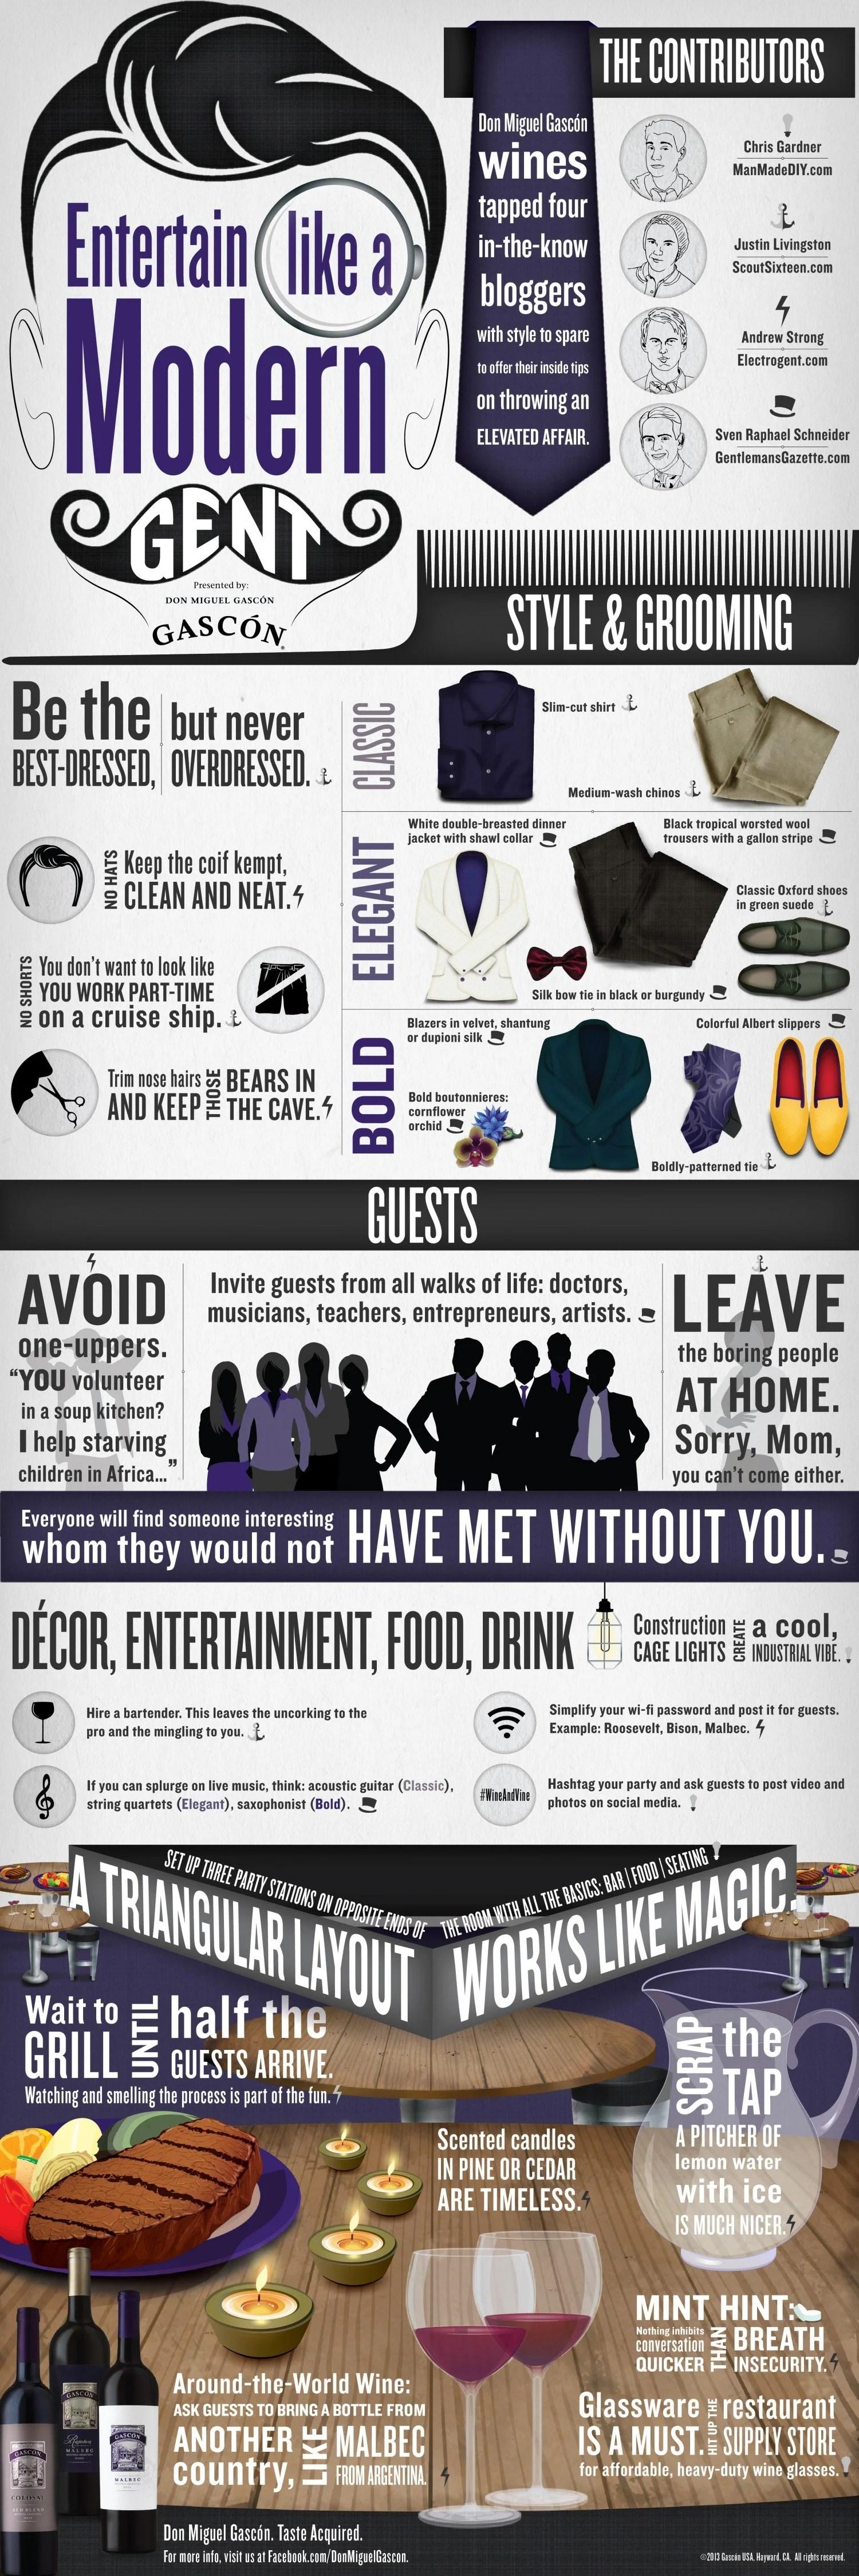 entertain-like-a-gentleman